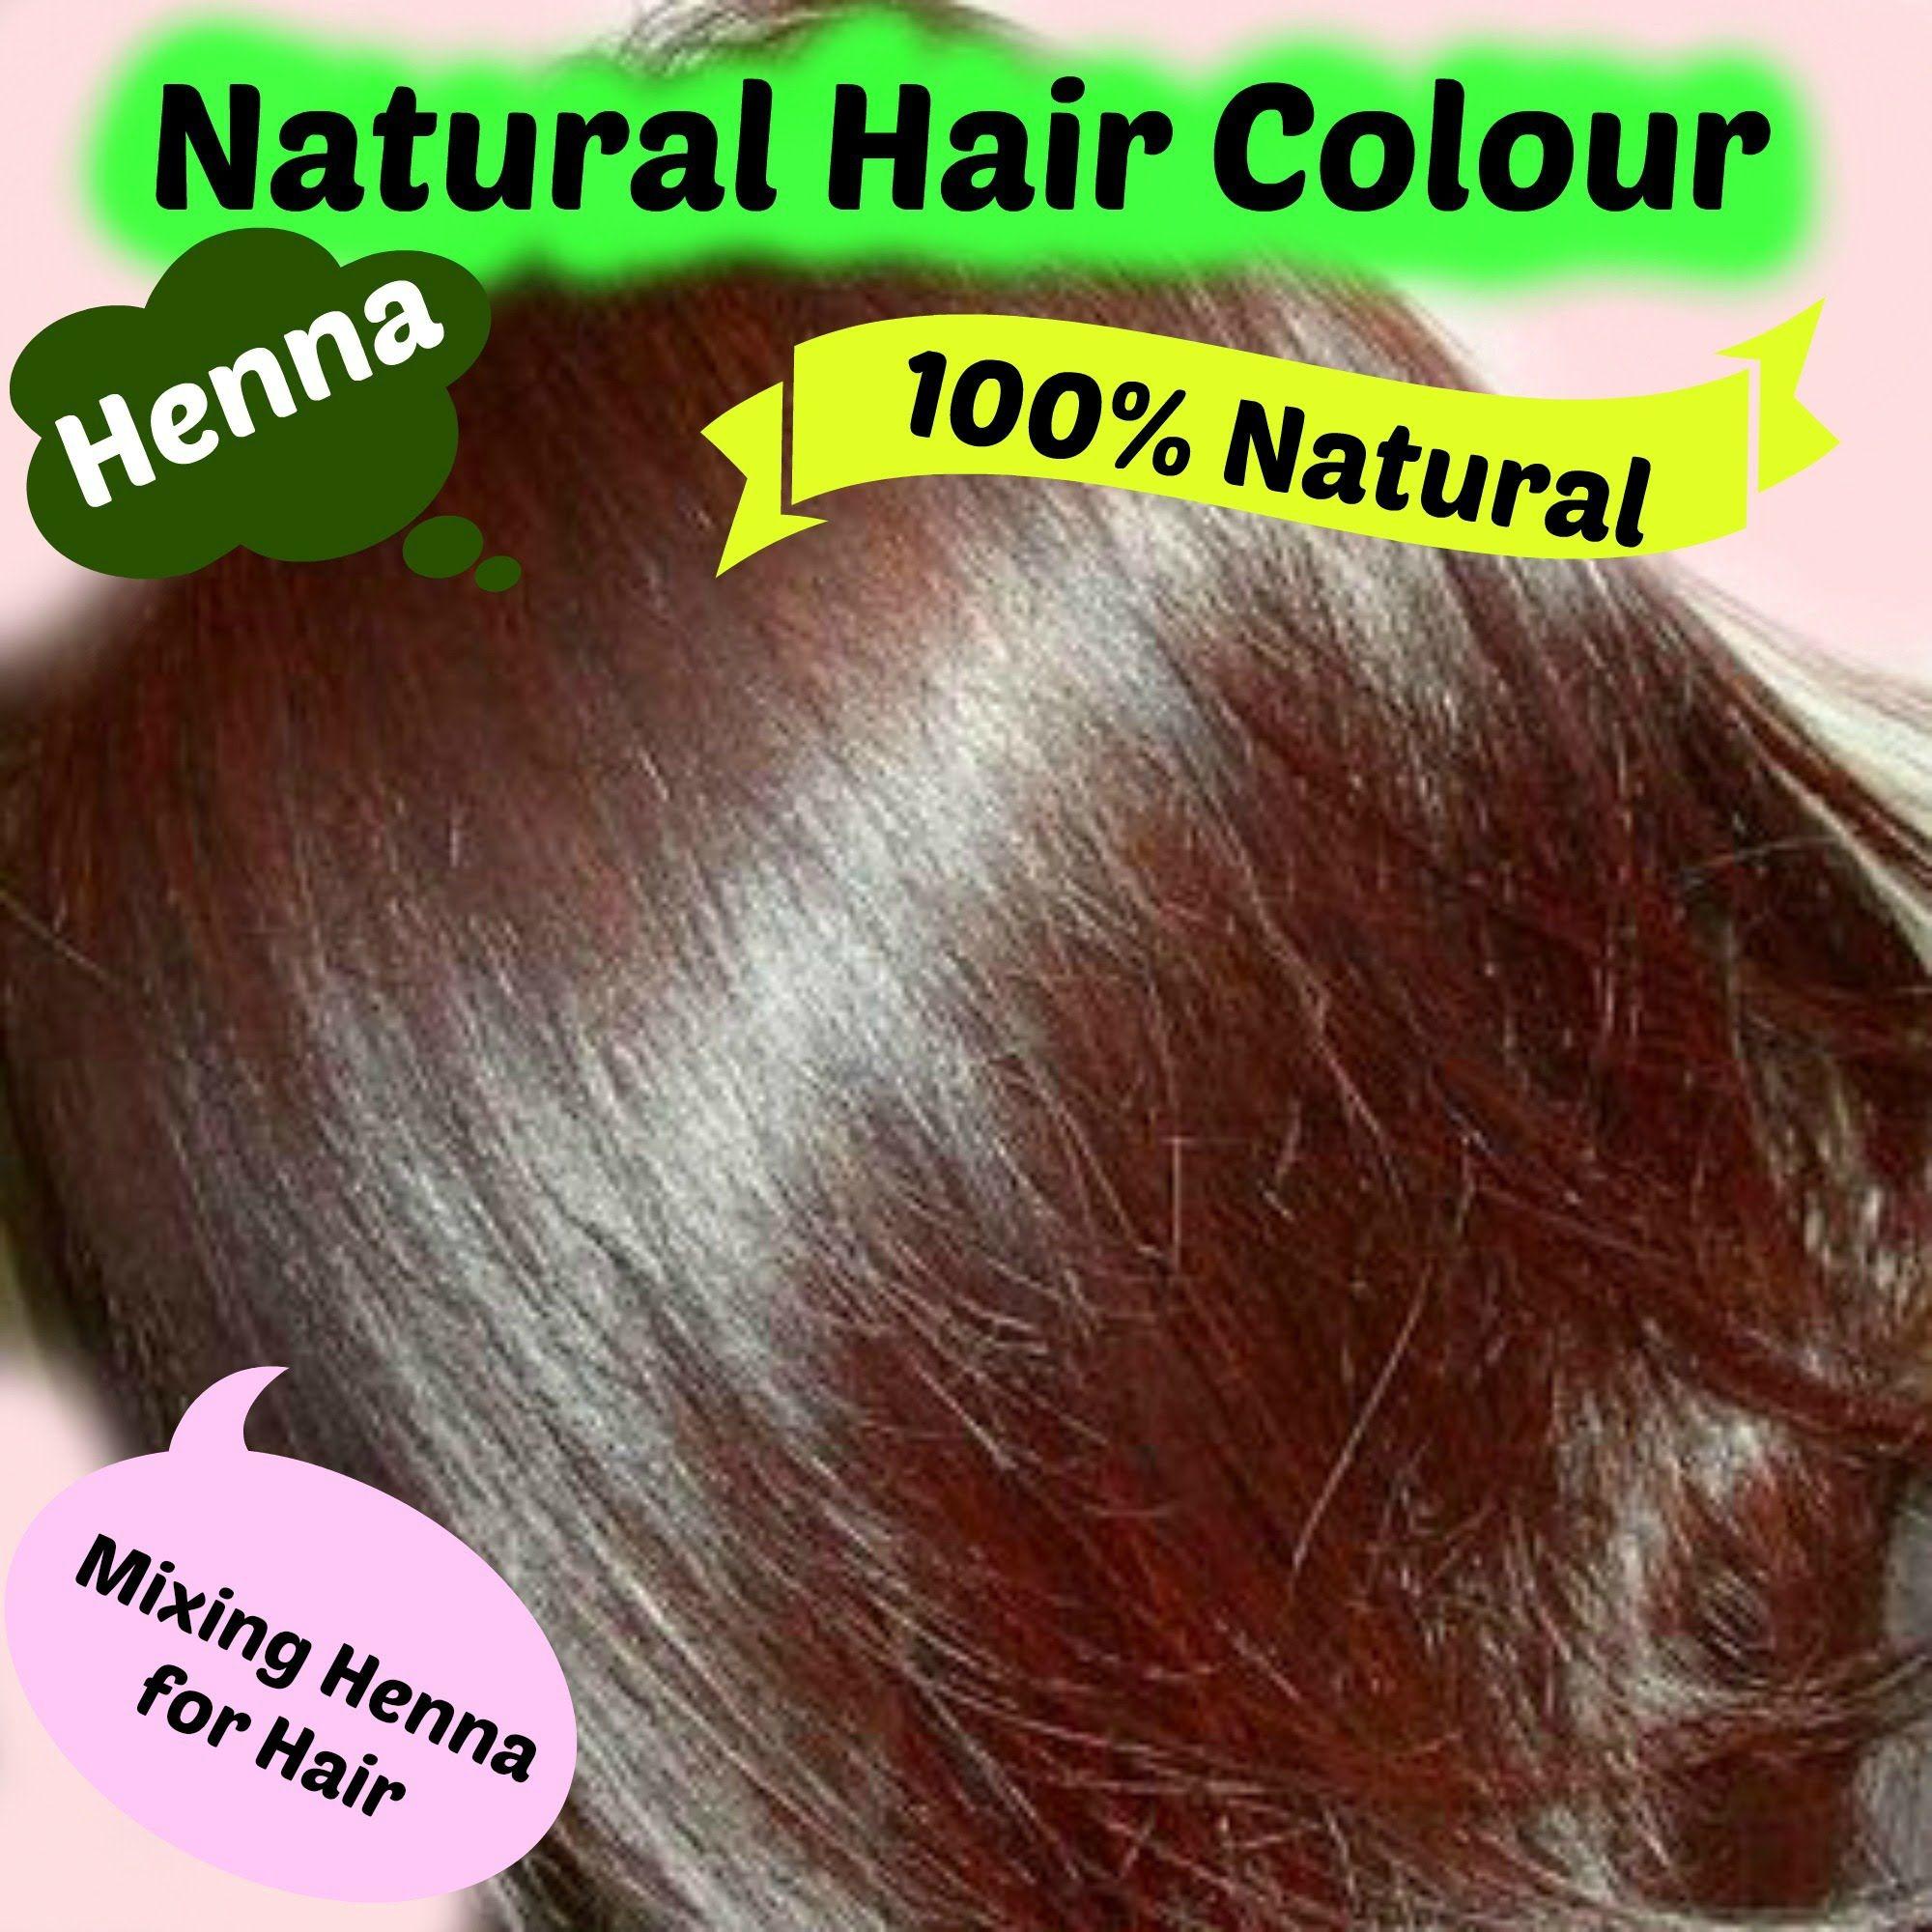 Henna For Hair In Telugu Hair And Beauty Hair Natural Hair